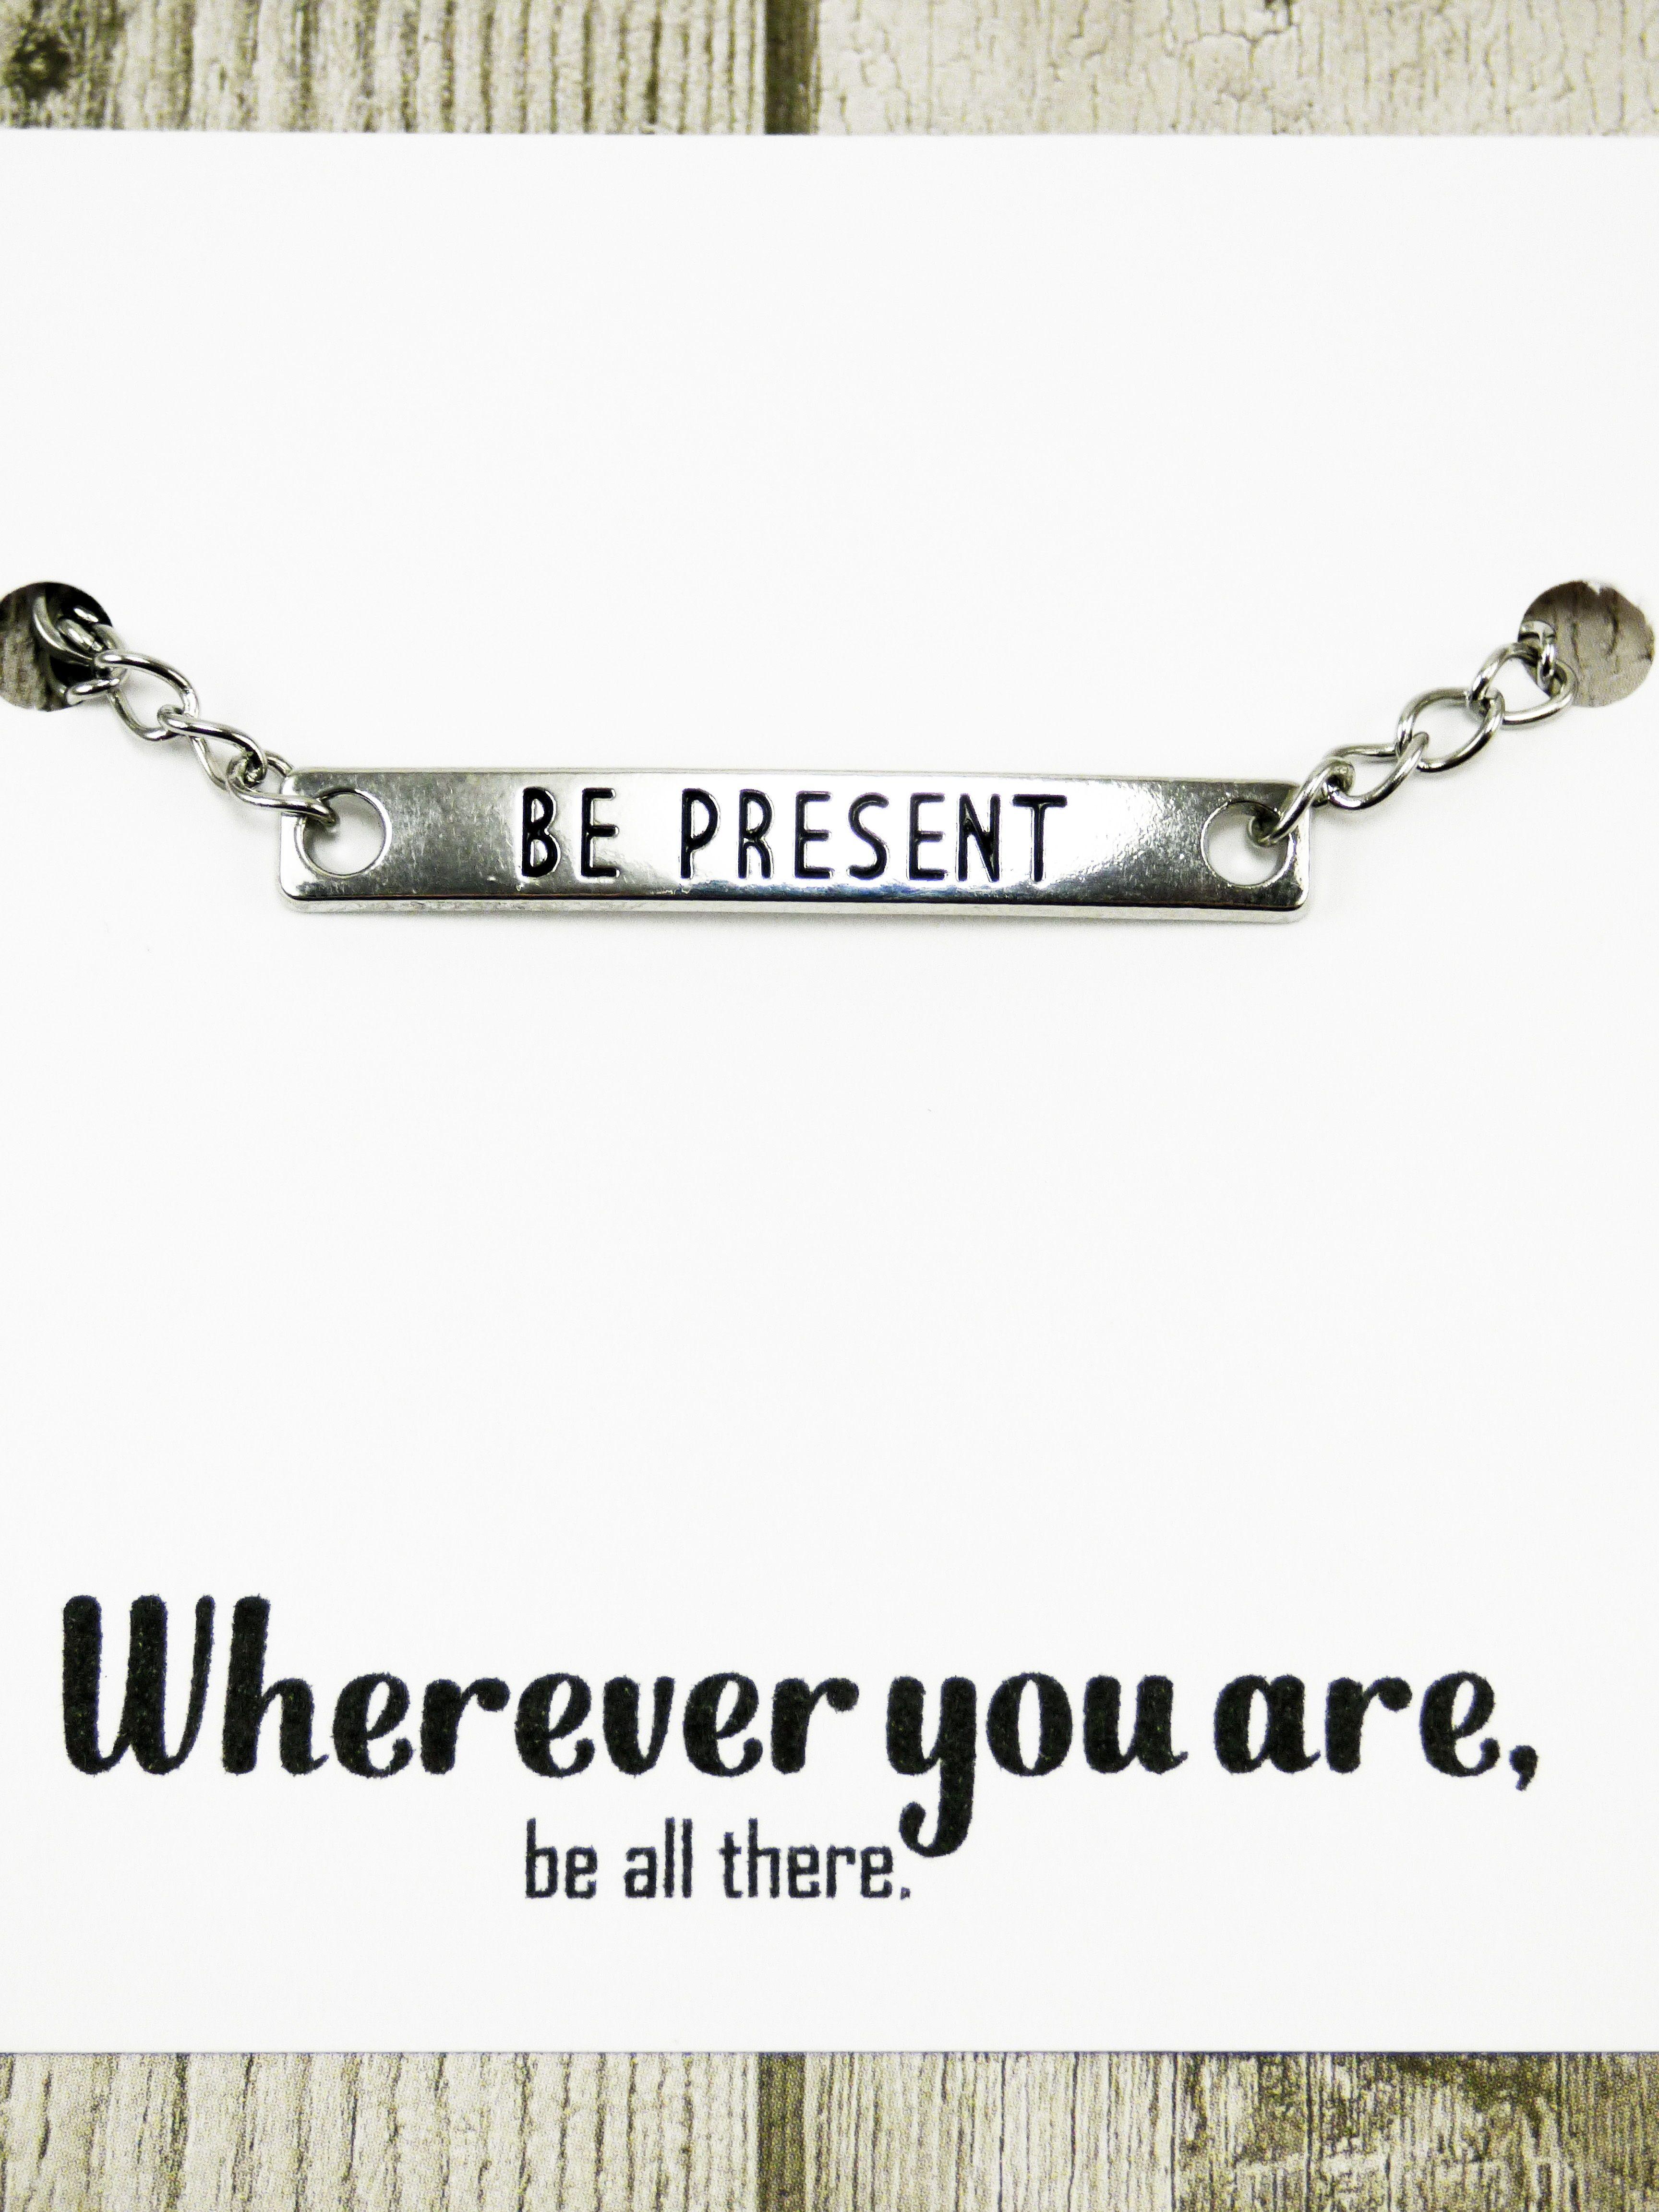 Be Present Bracelet Inspirational Quotes Bracelets Motivational Live Life Quotes Meaningful Gifts For Mens Bracelets With Meaning Words Bracelet Quotes Bracelets With Meaning Bracelets For Men